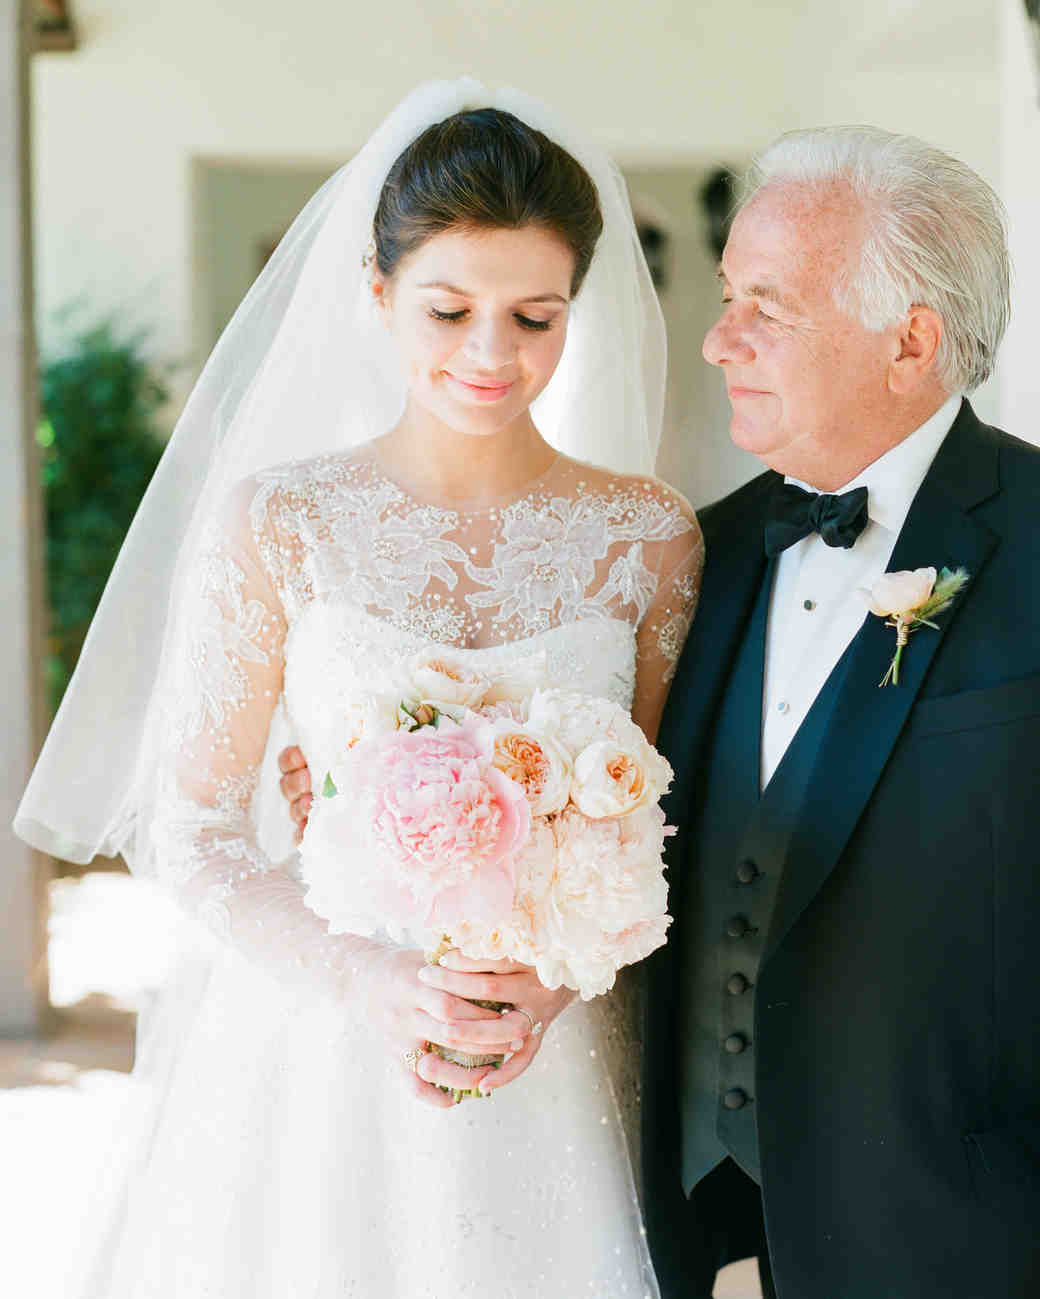 casey-david-wedding-ojai-0262-s111709.jpg